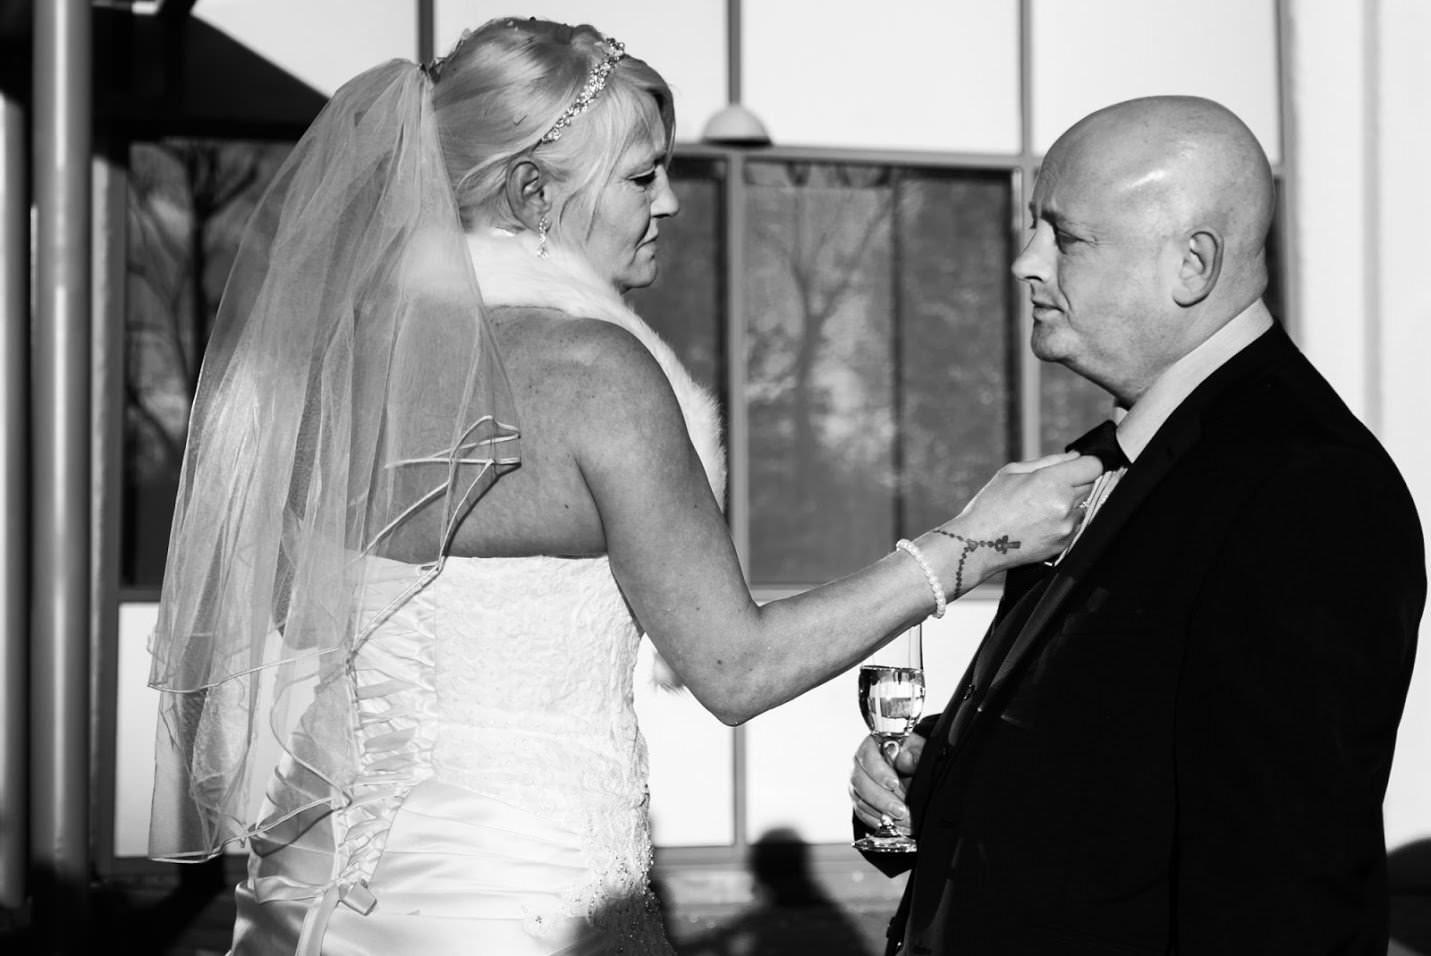 MarkHeather 164658 - Solihull Registry Office Wedding - Mark & Heather